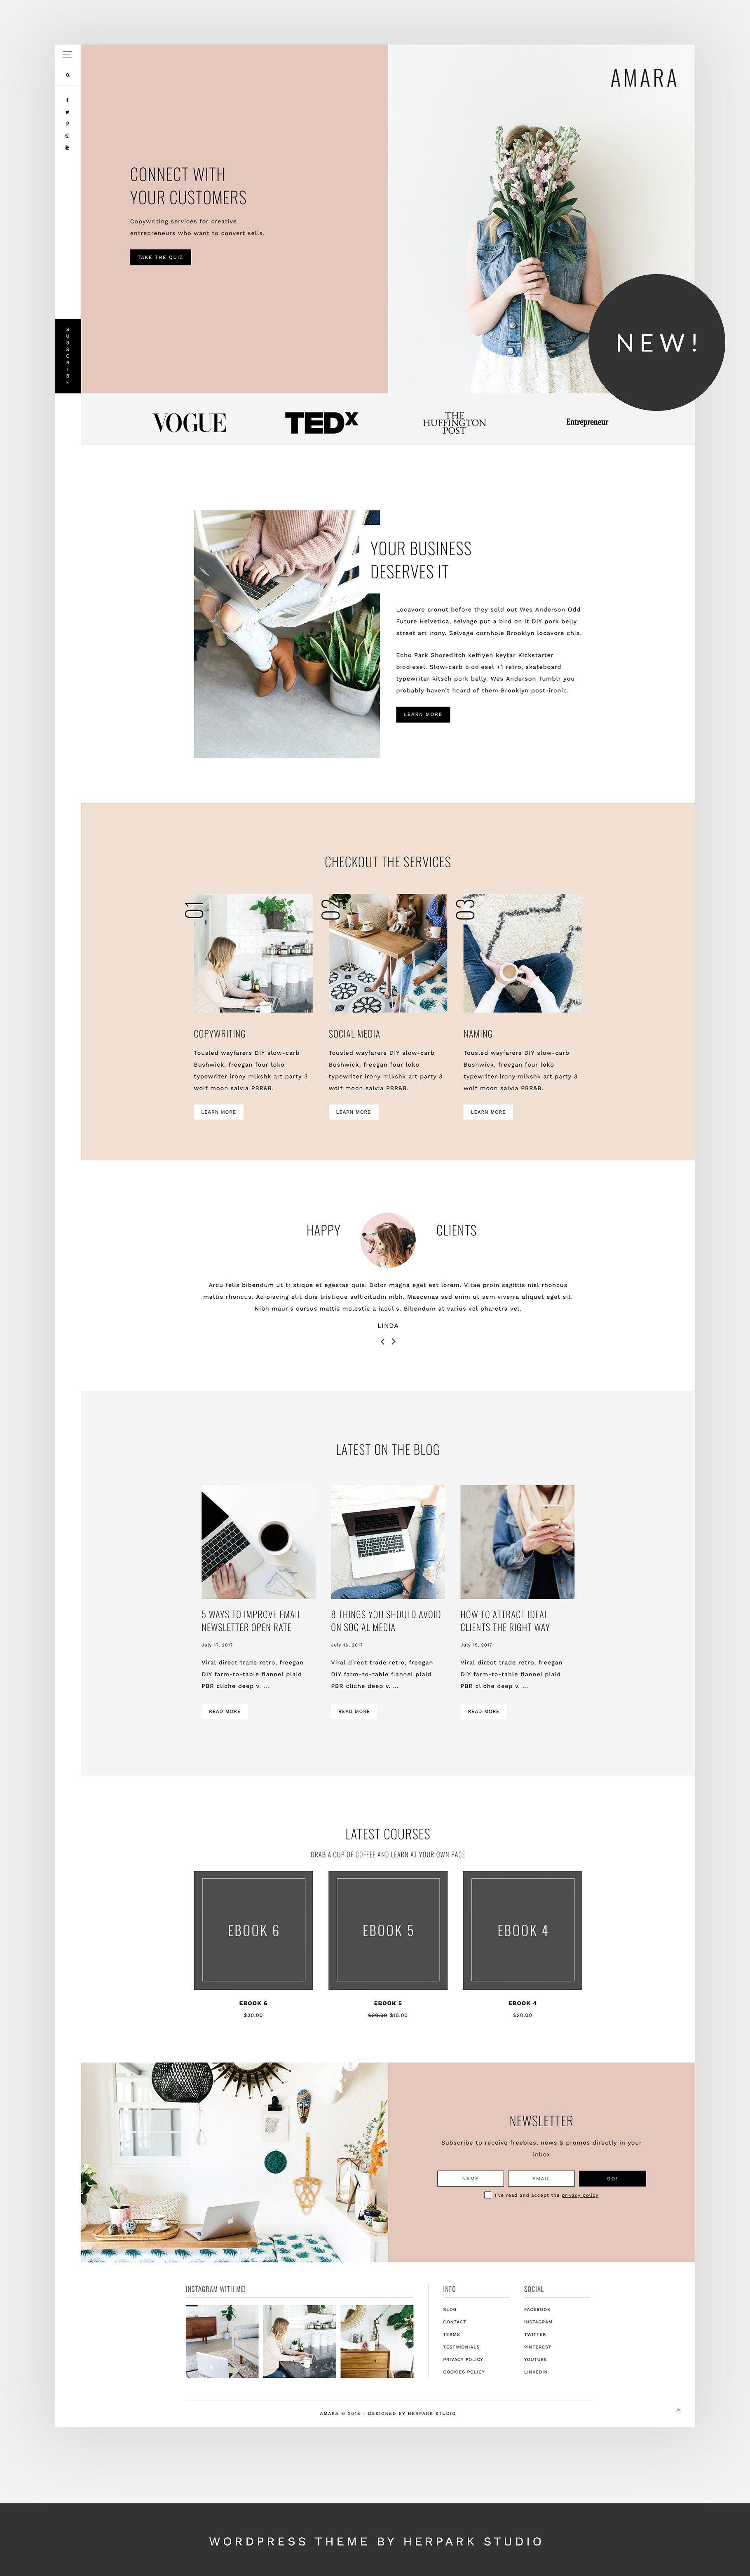 Amara A Theme For Entrepreneurs Genesis Child Themes Feminine Wordpress Theme Website Design Inspiration